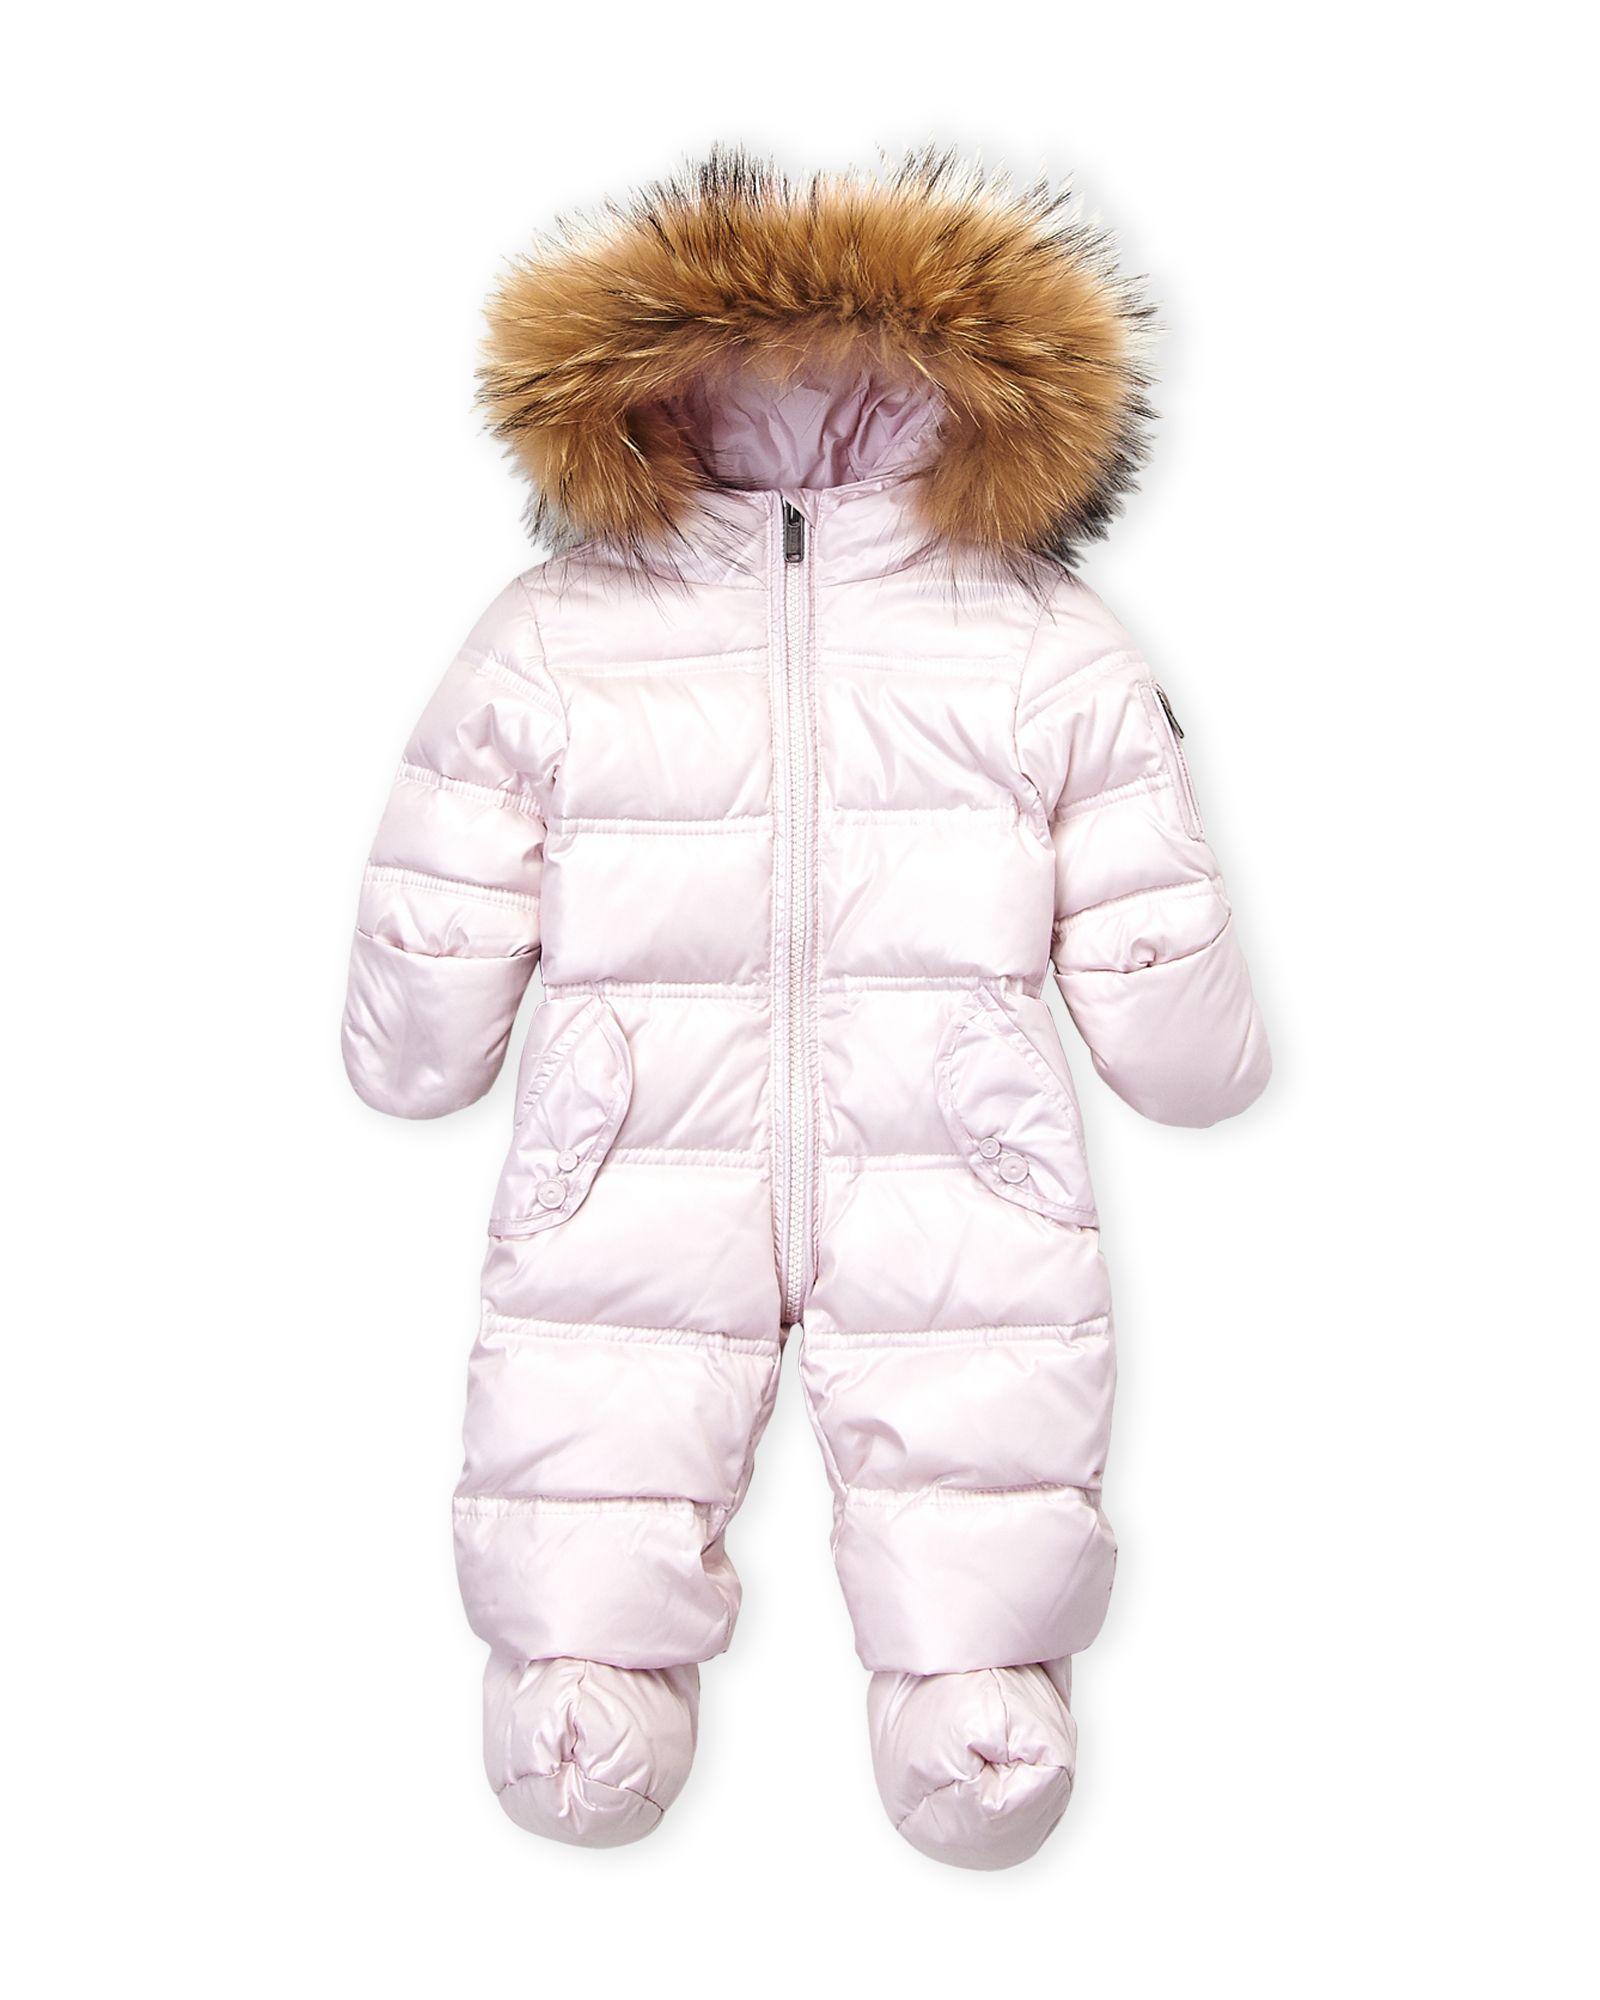 e3de3eca0 Newborn/Infant Girls) Real Fur Trim Hooded Down Snowsuit | *Apparel ...